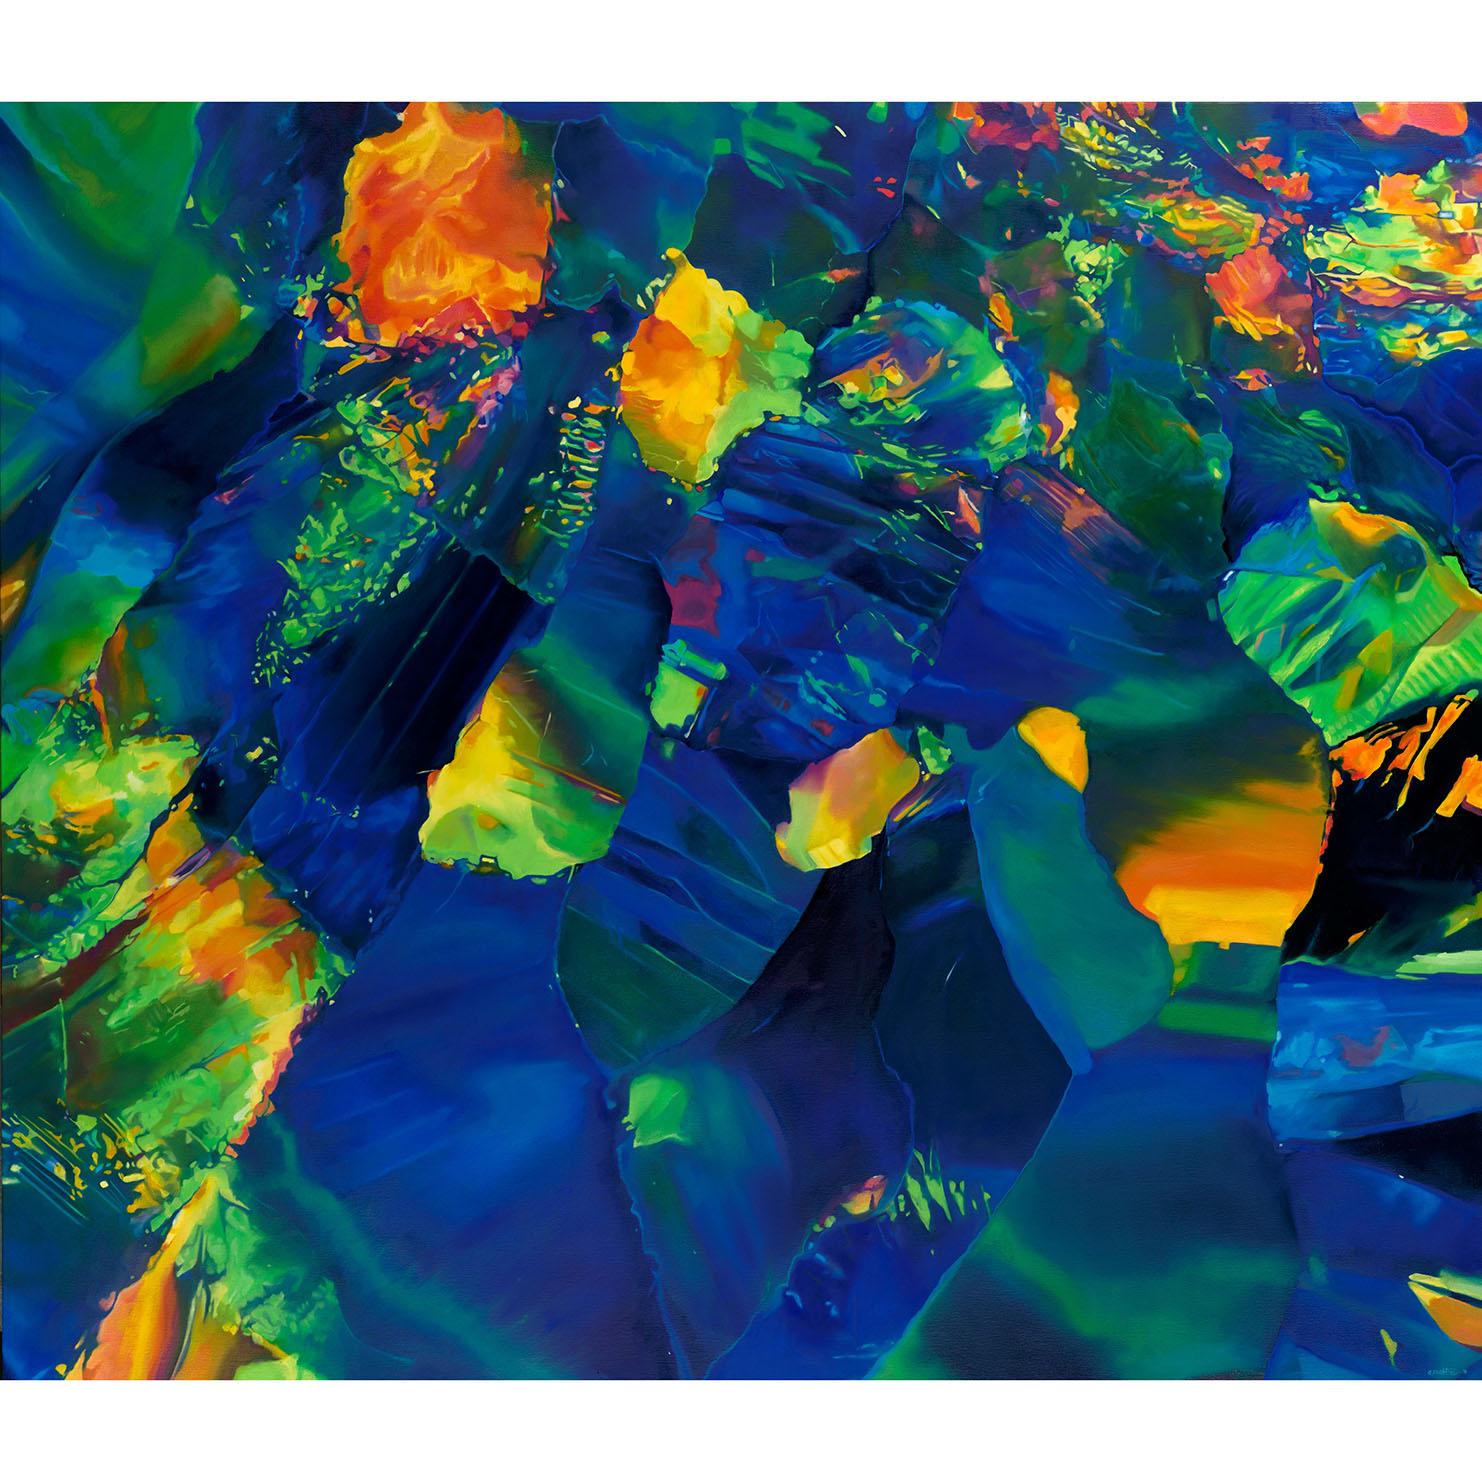 - INDIGOblack opaloil on panel60 x 52 in2019